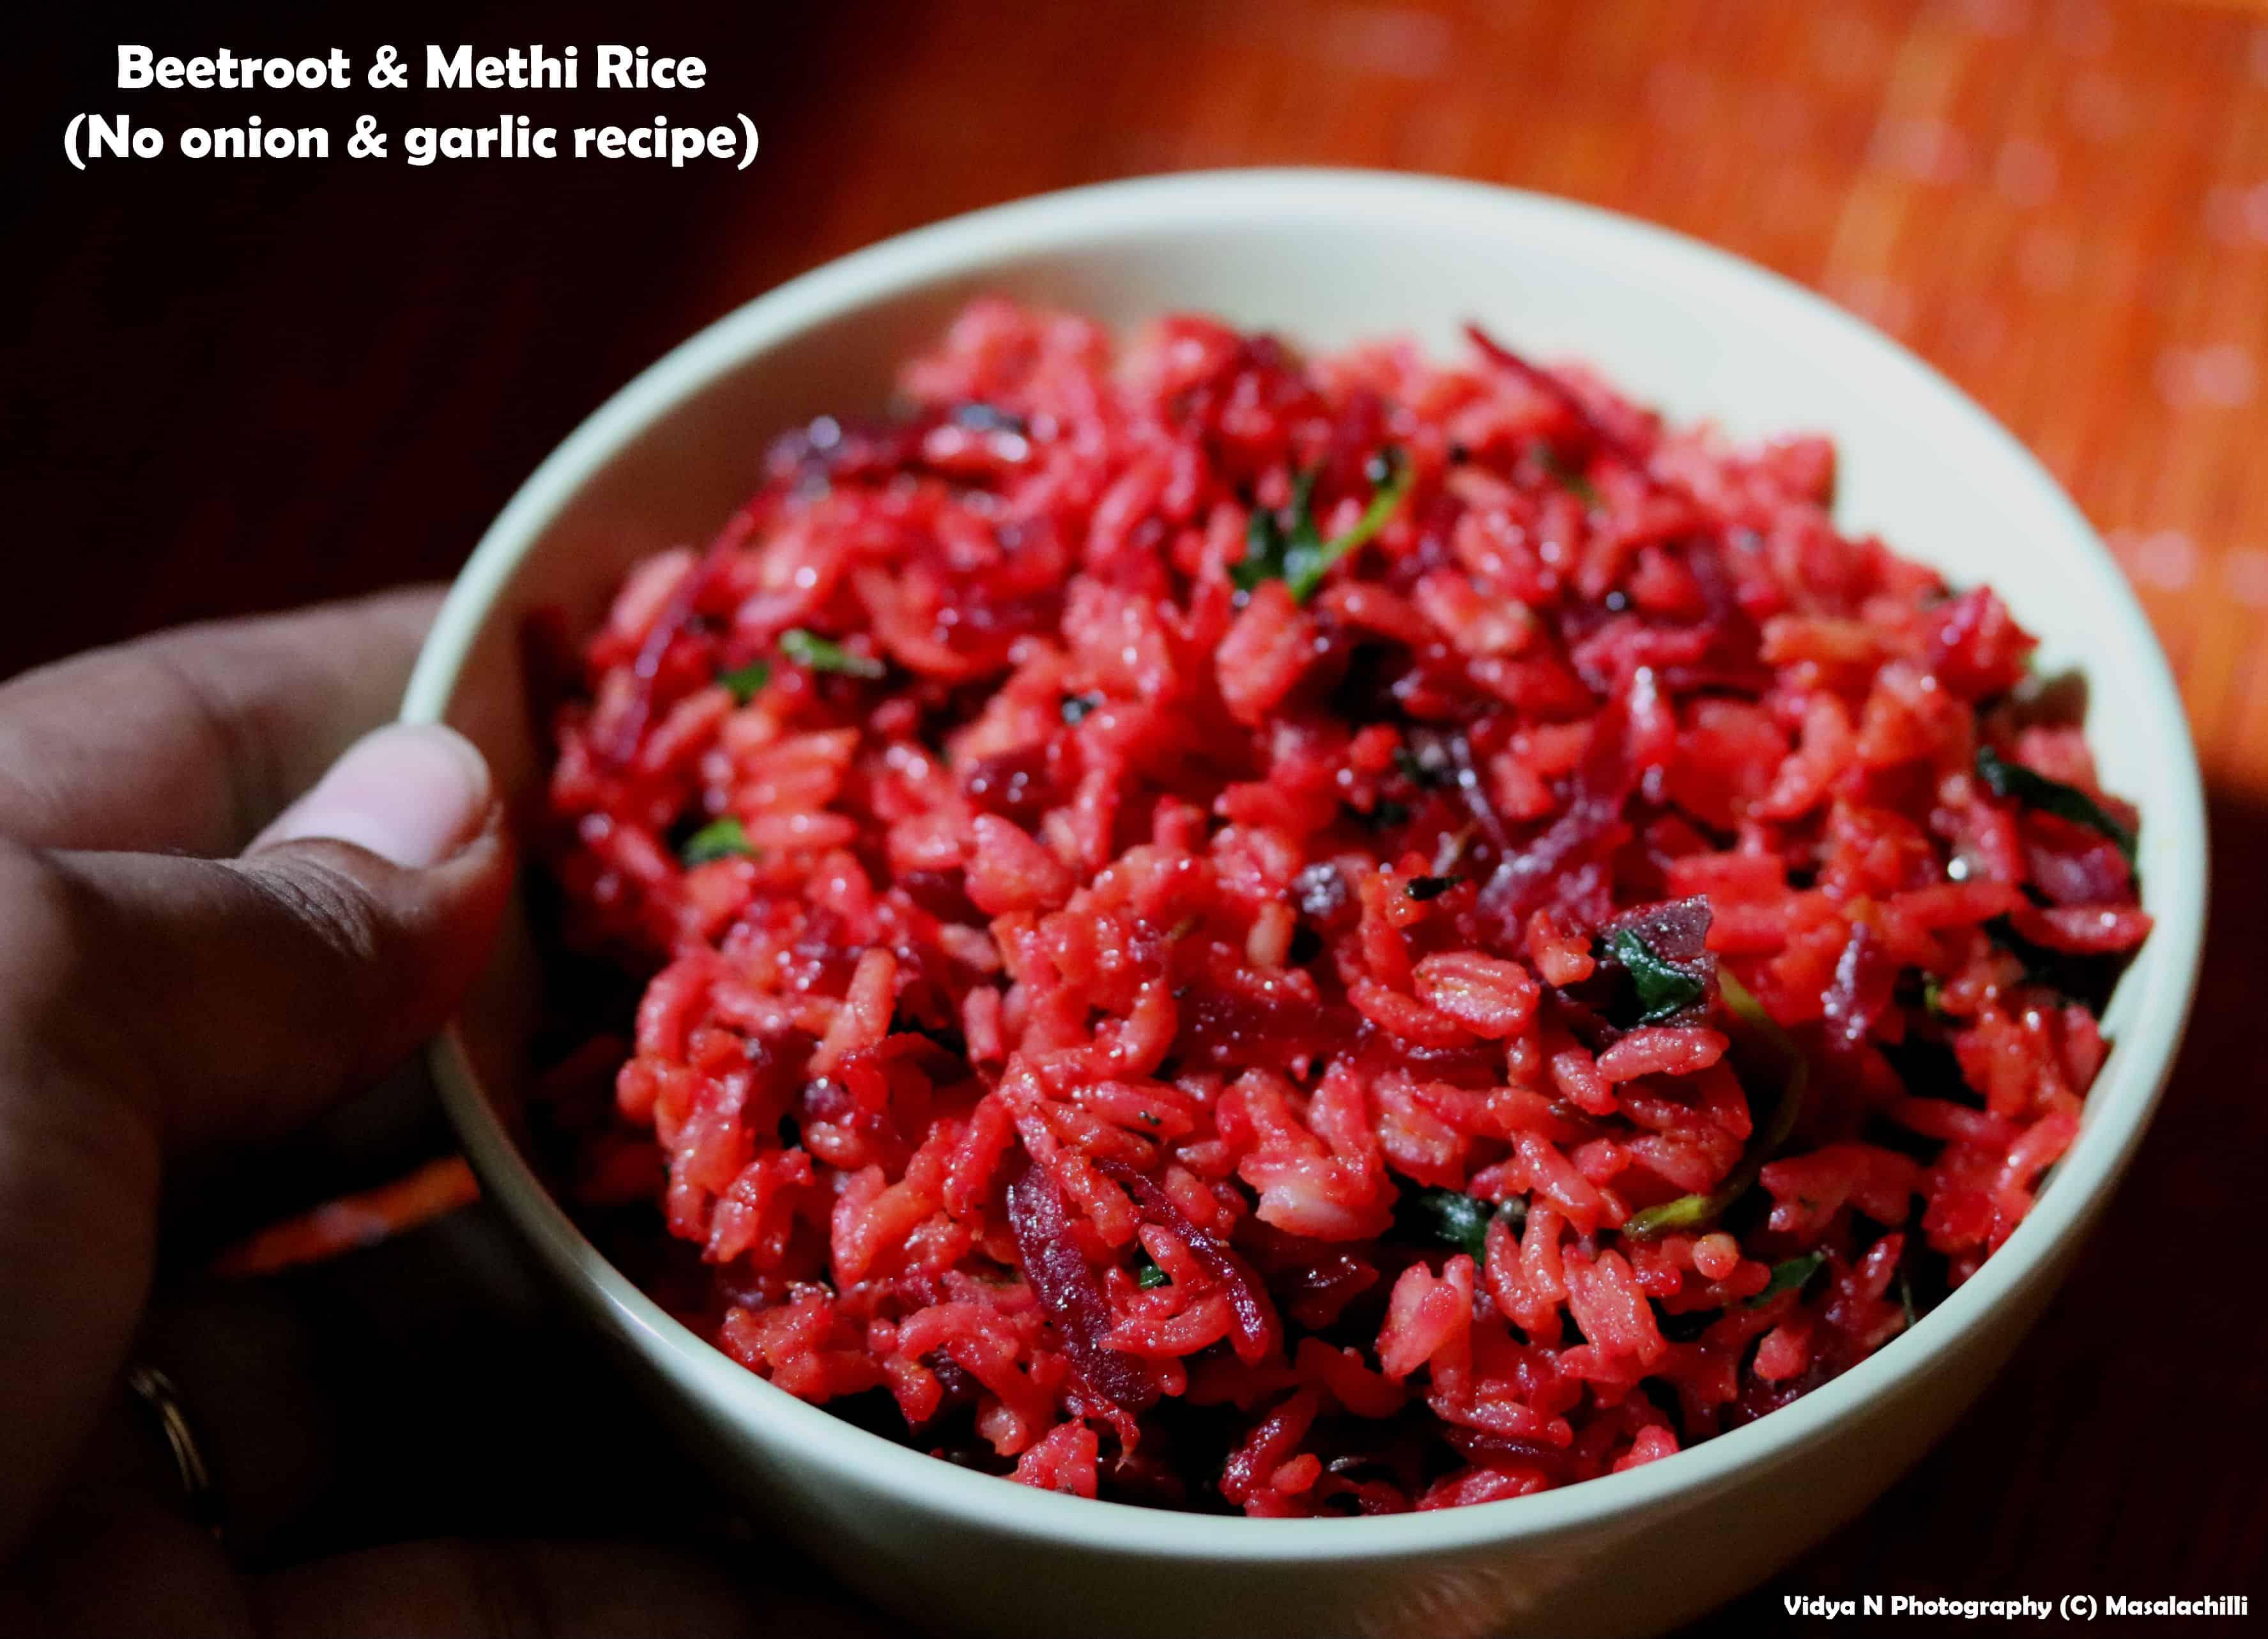 Beetroot Methi Rice (leftover rice recipe)